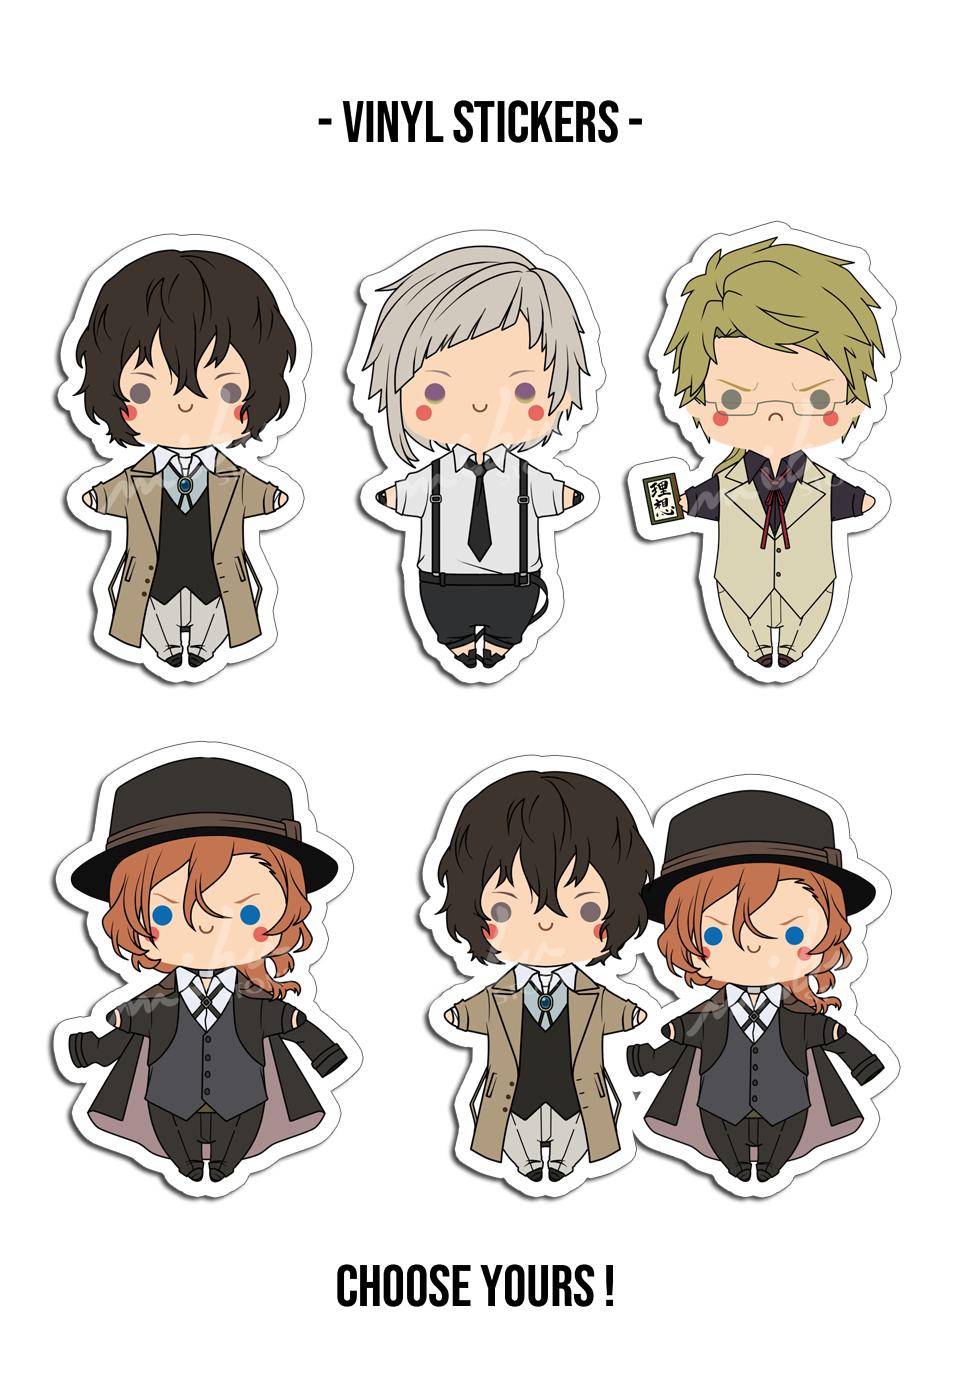 Bsd Vinyl Stickers Anime Stickers Print Stickers Stickers